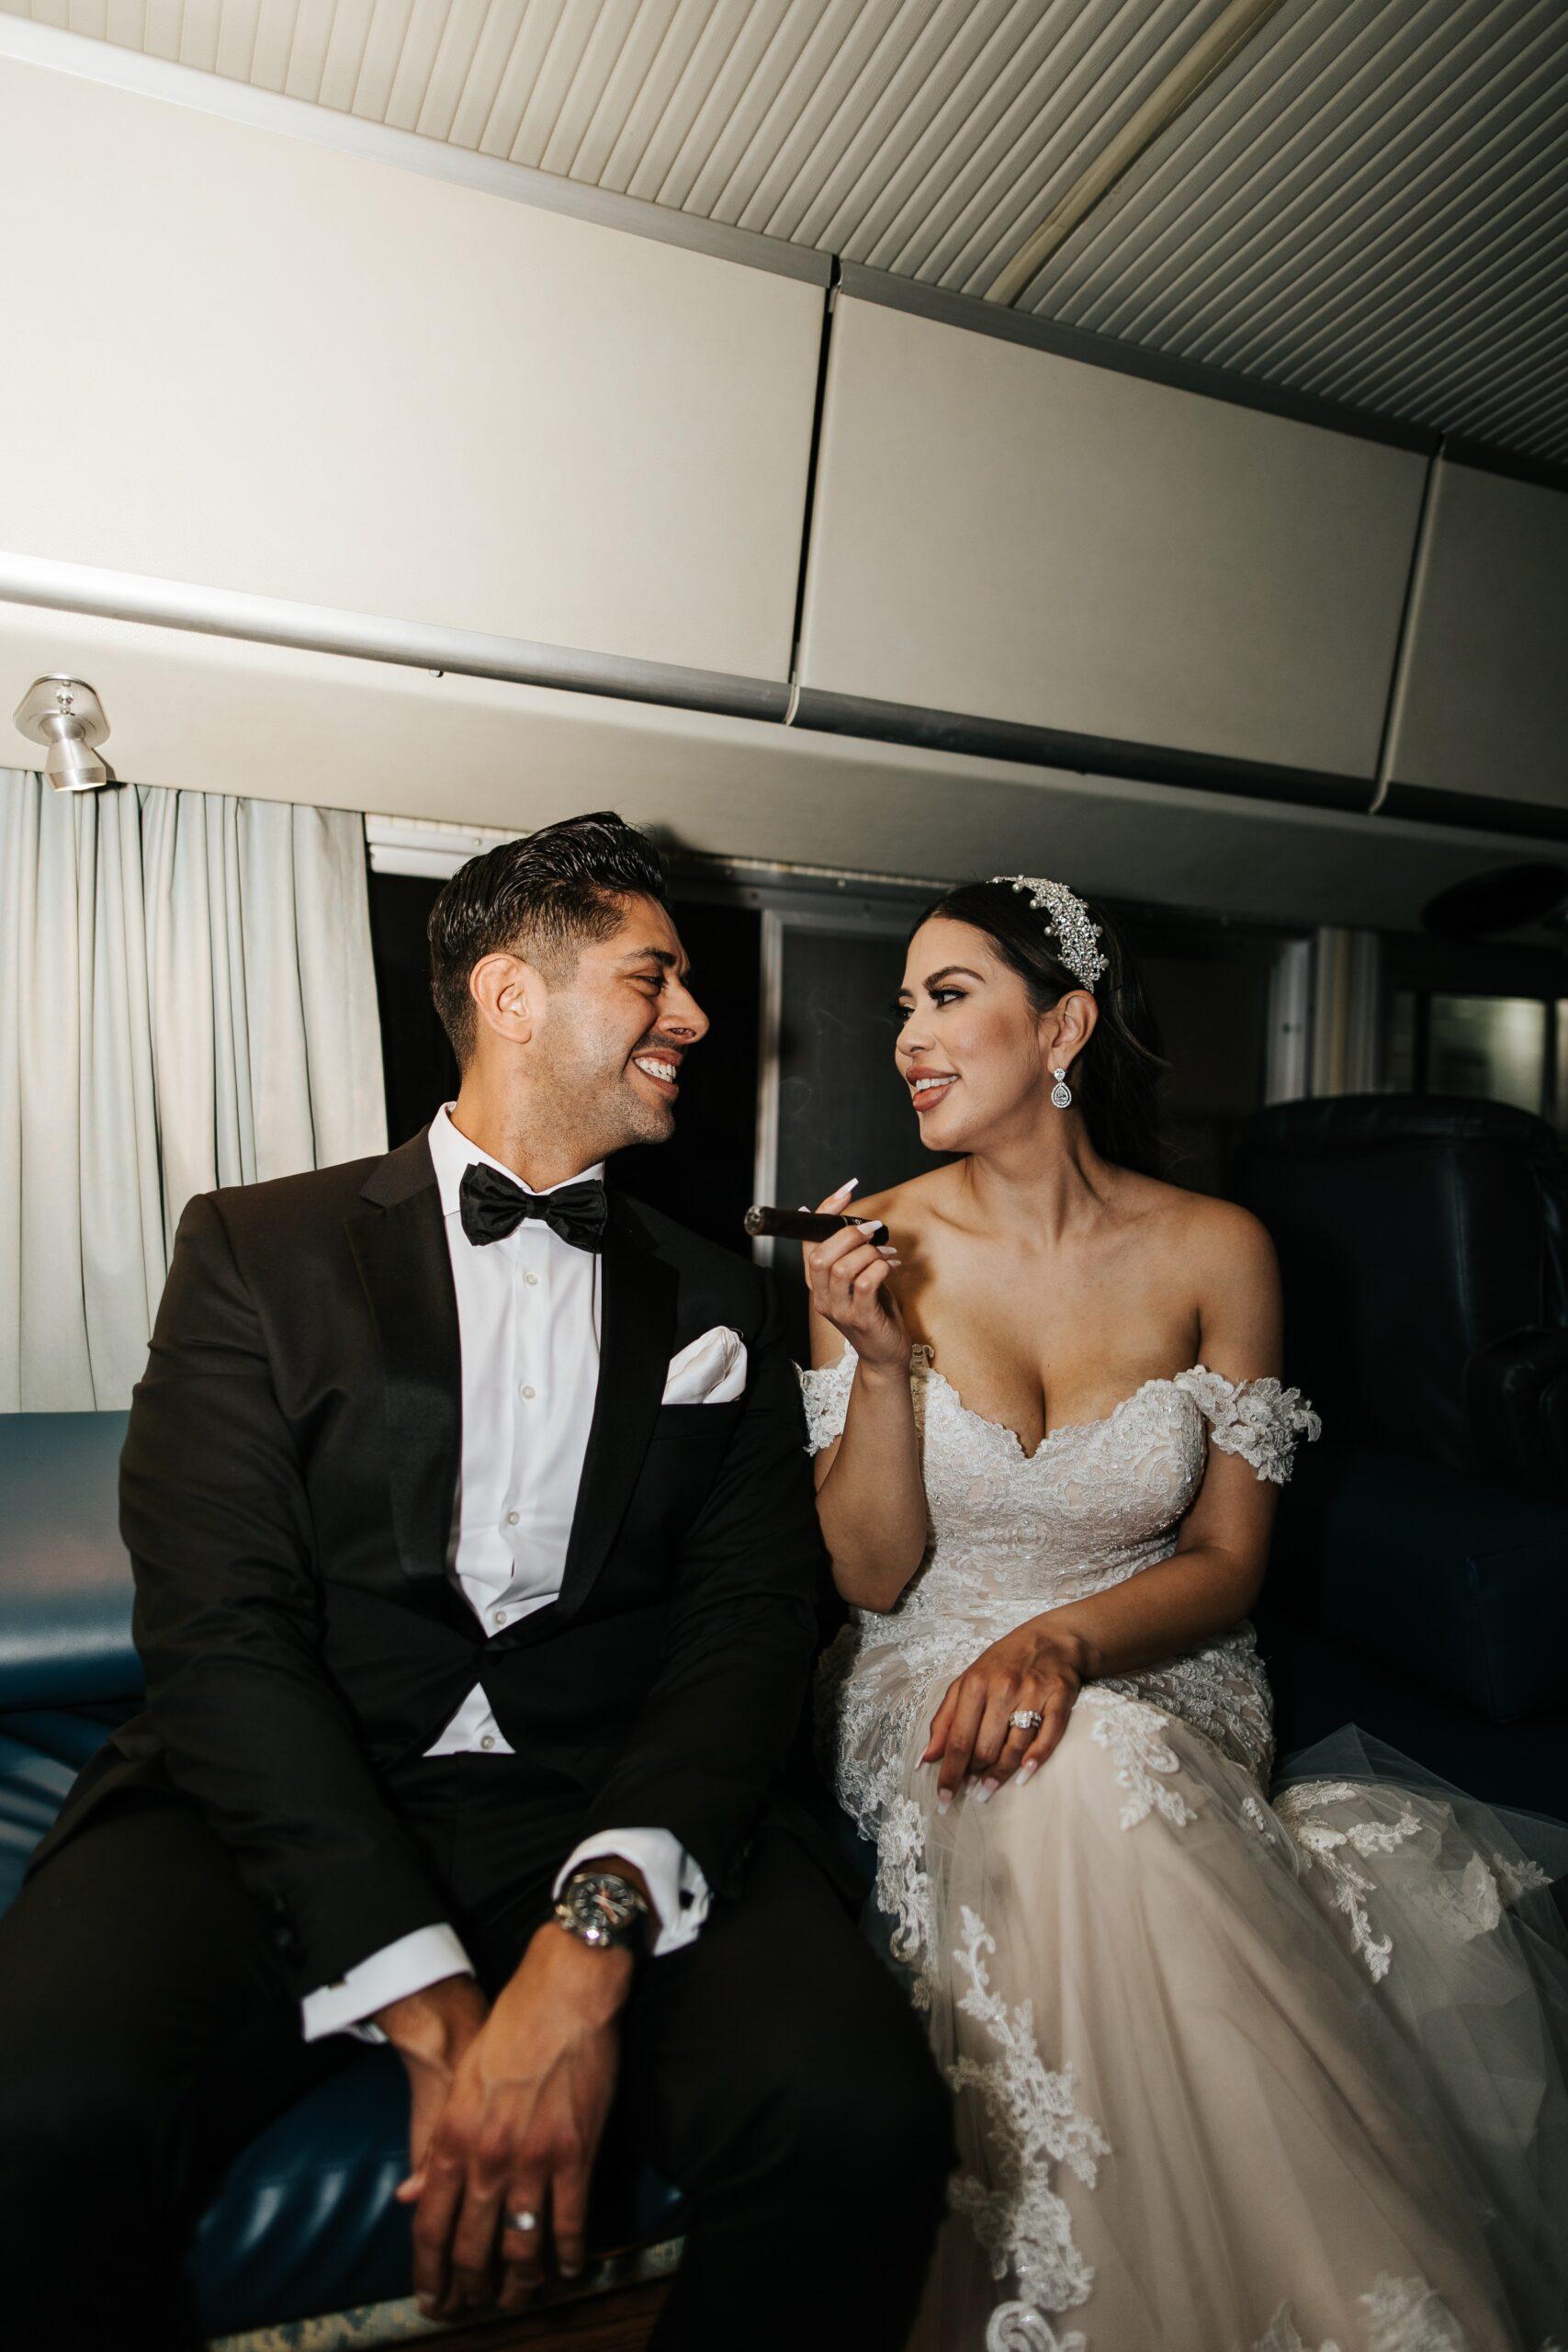 San Antonio Weddings couple, Alma and James, featuring At Last Entertainment